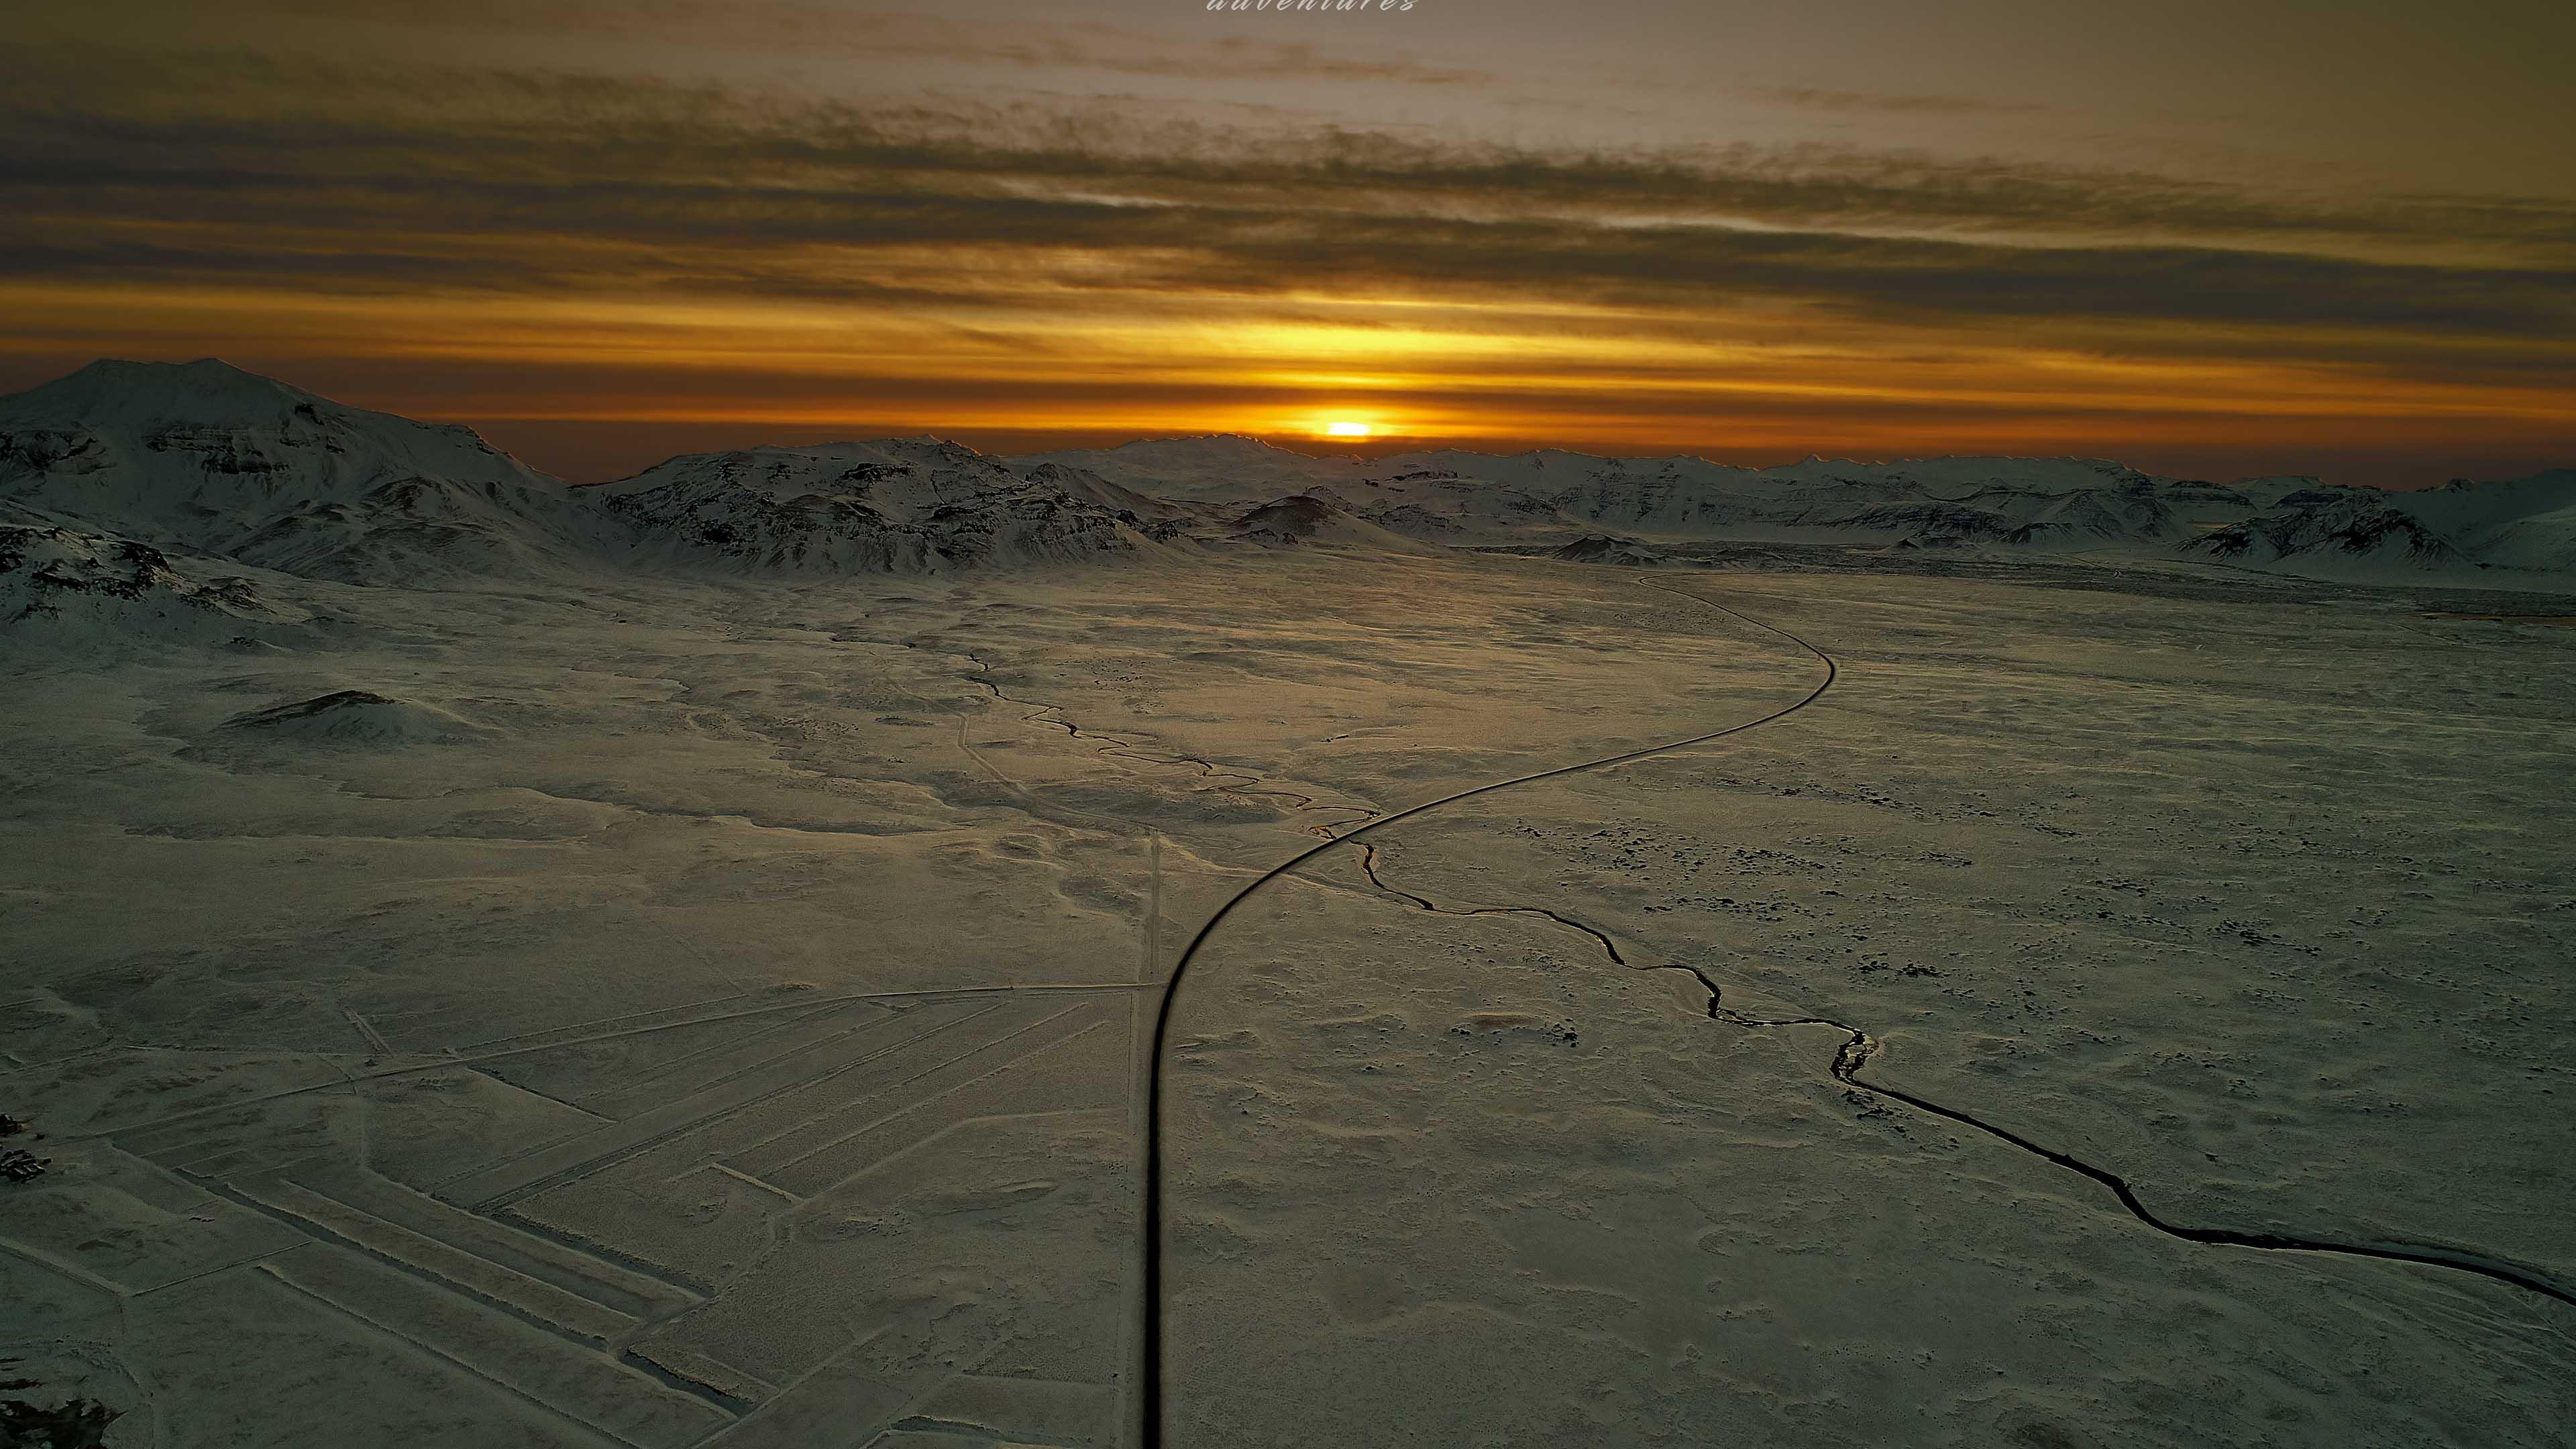 Snæfelsness sunsetweb